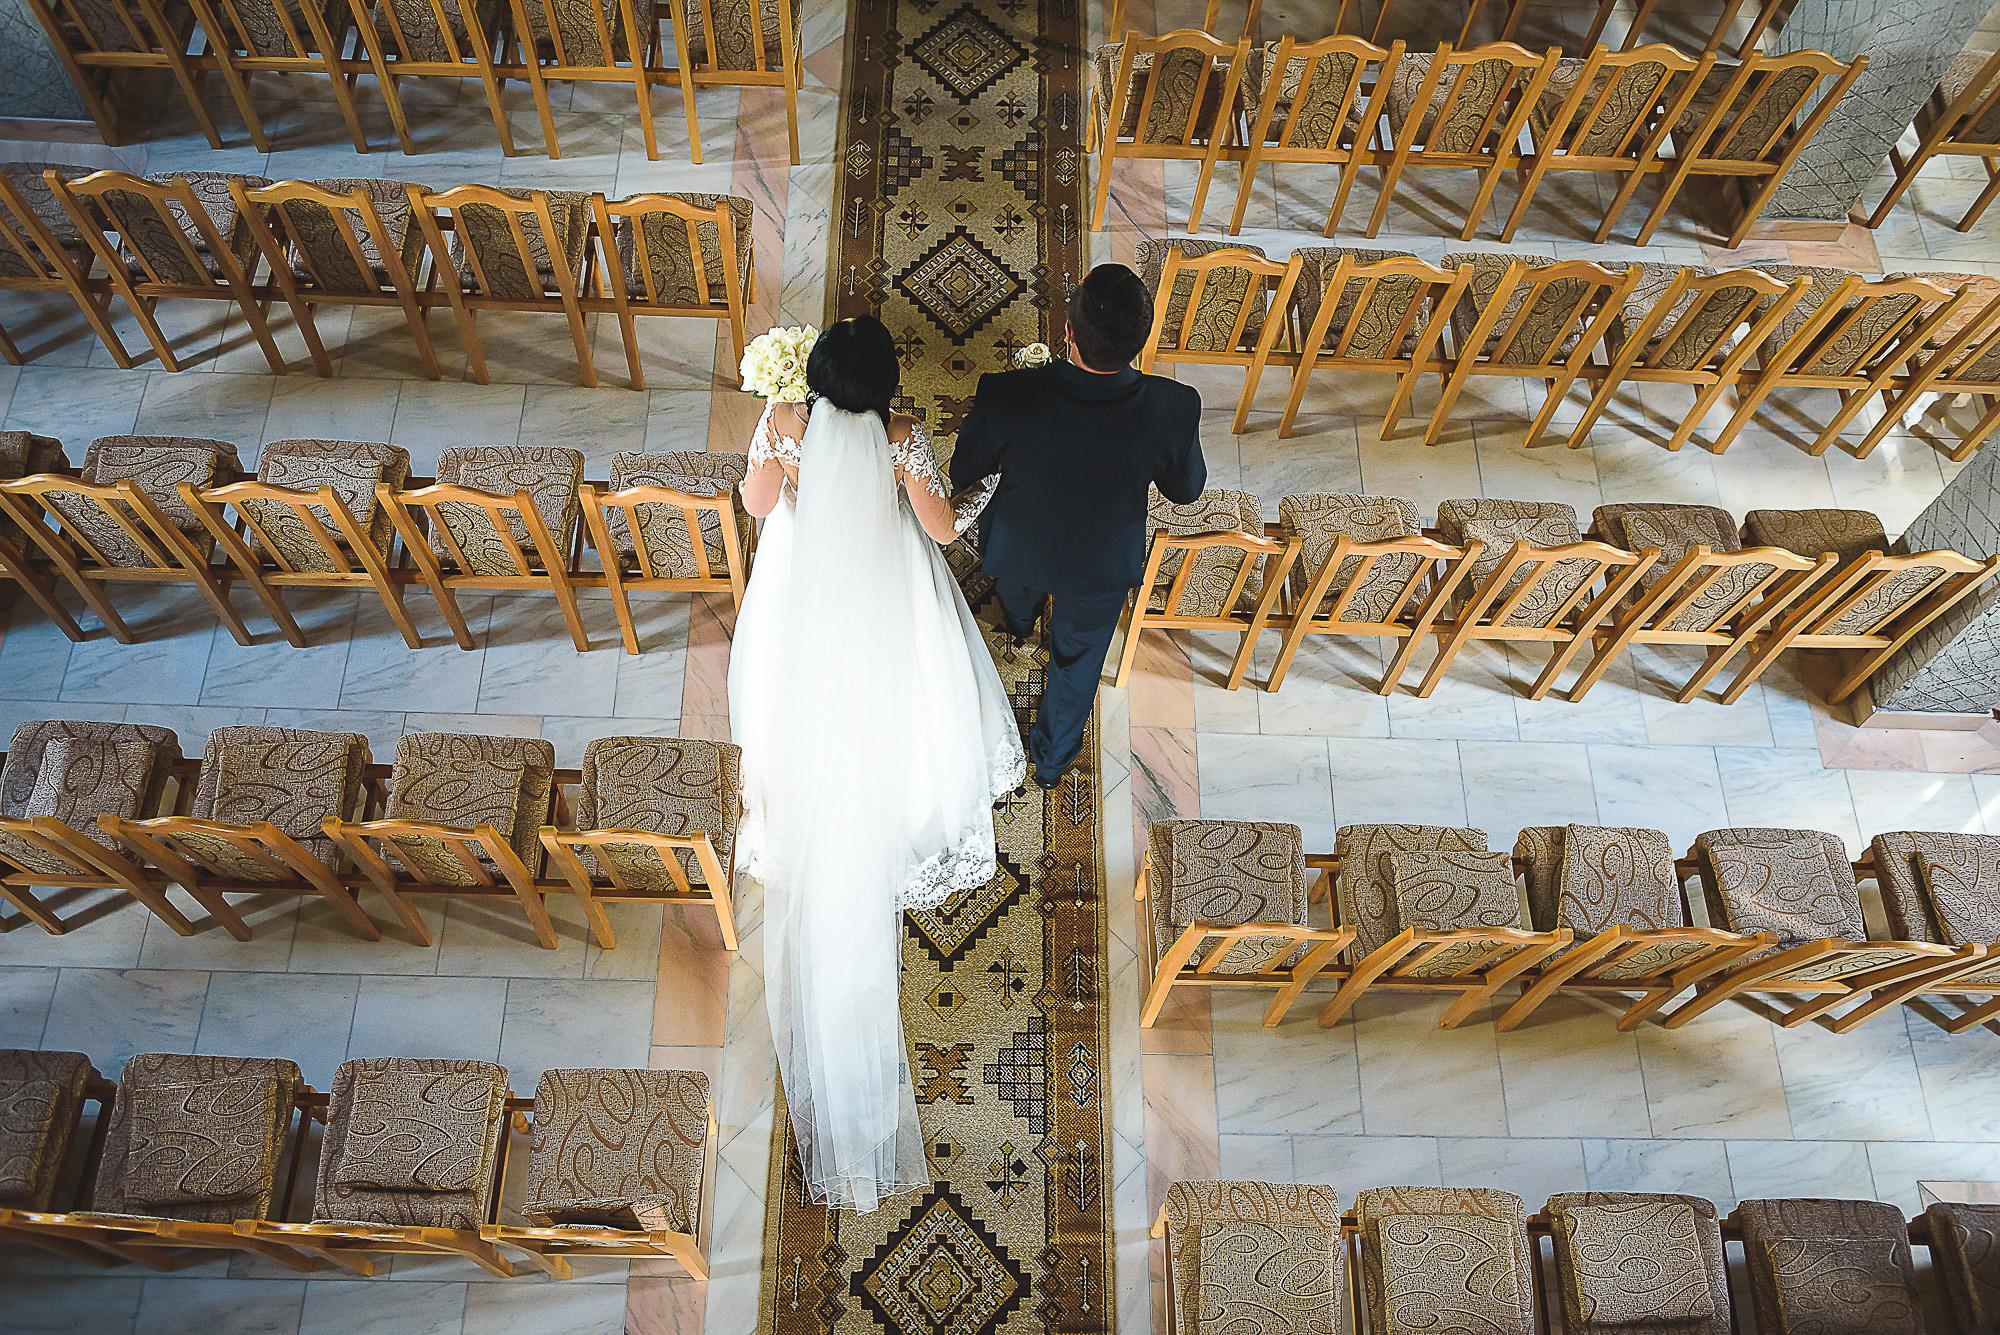 intrarea miresei in biserica, cununia religioasa, biserica ortodoxa, fotografie creativa de nunta, fotograf nunta mures, foto nunta reghin, foto video reghin, foto video nunta mures